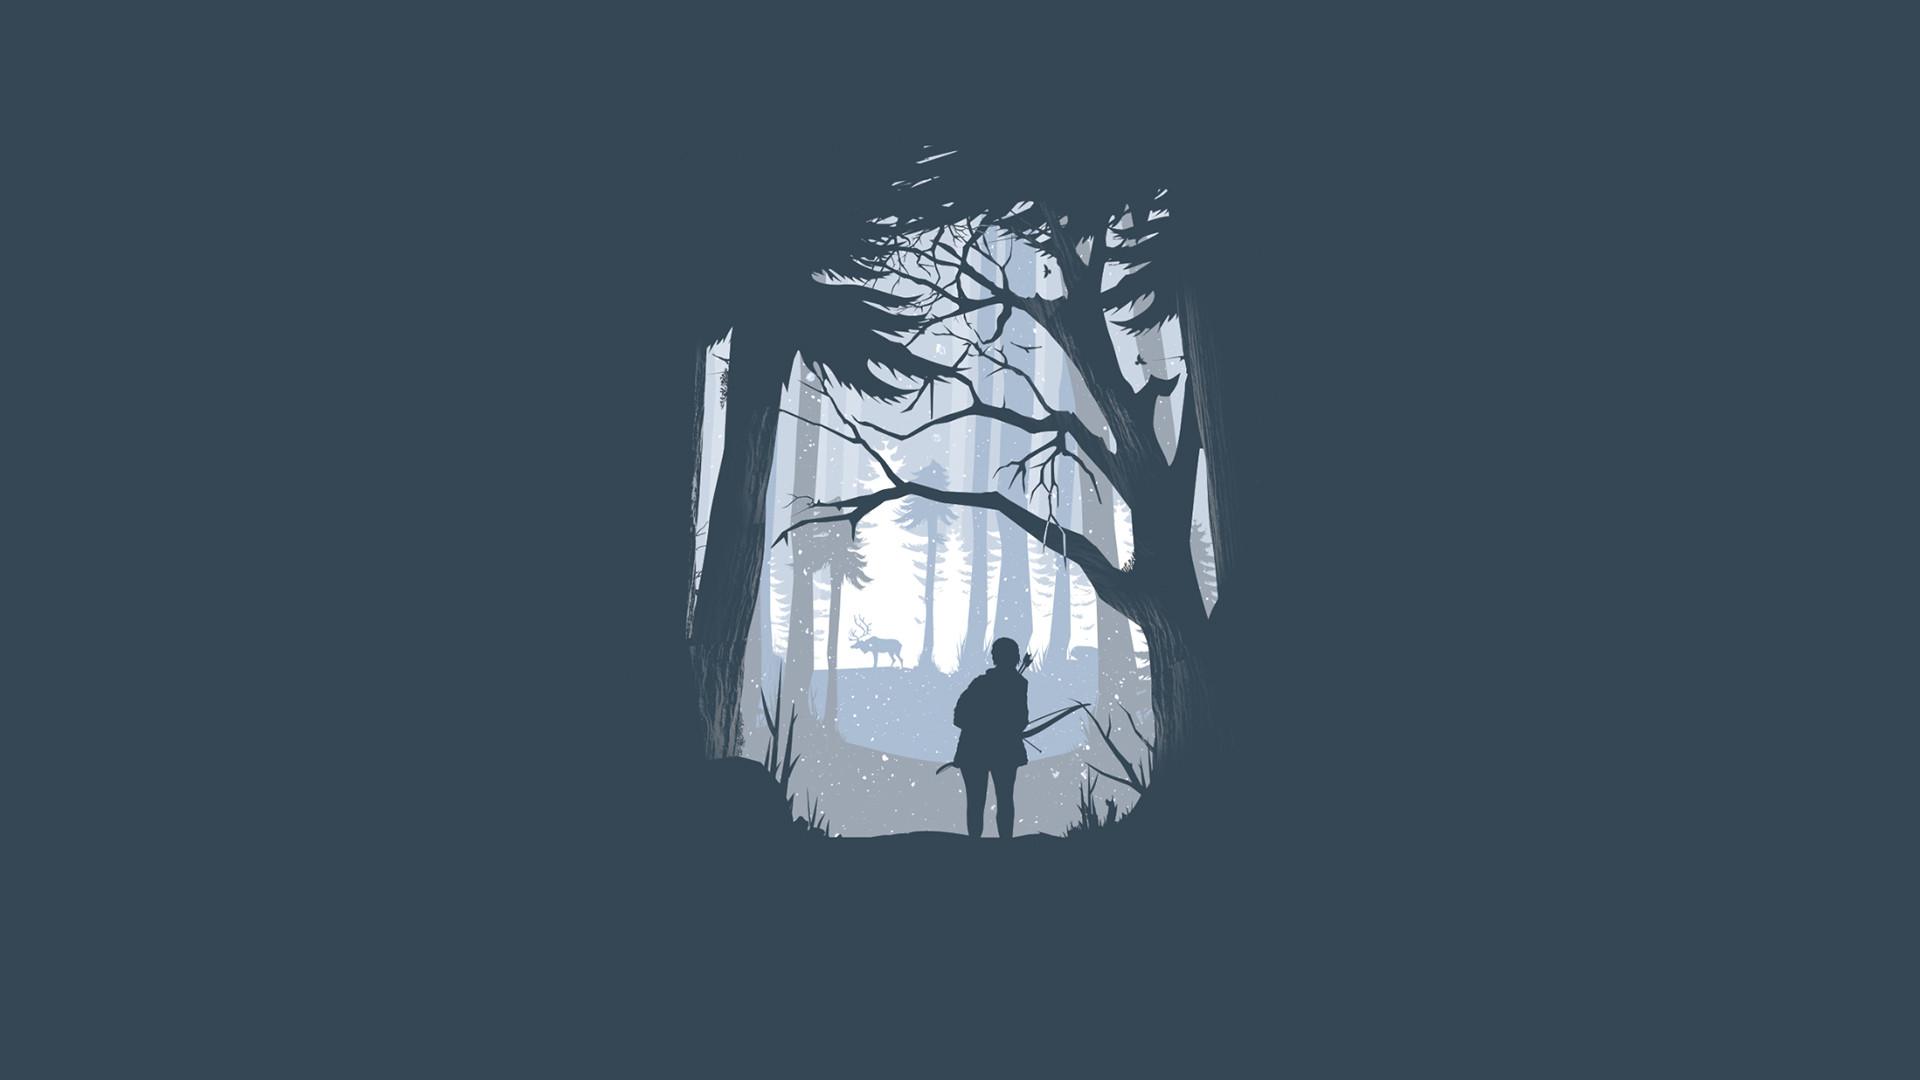 Minimalist Last of Us Wallpaper